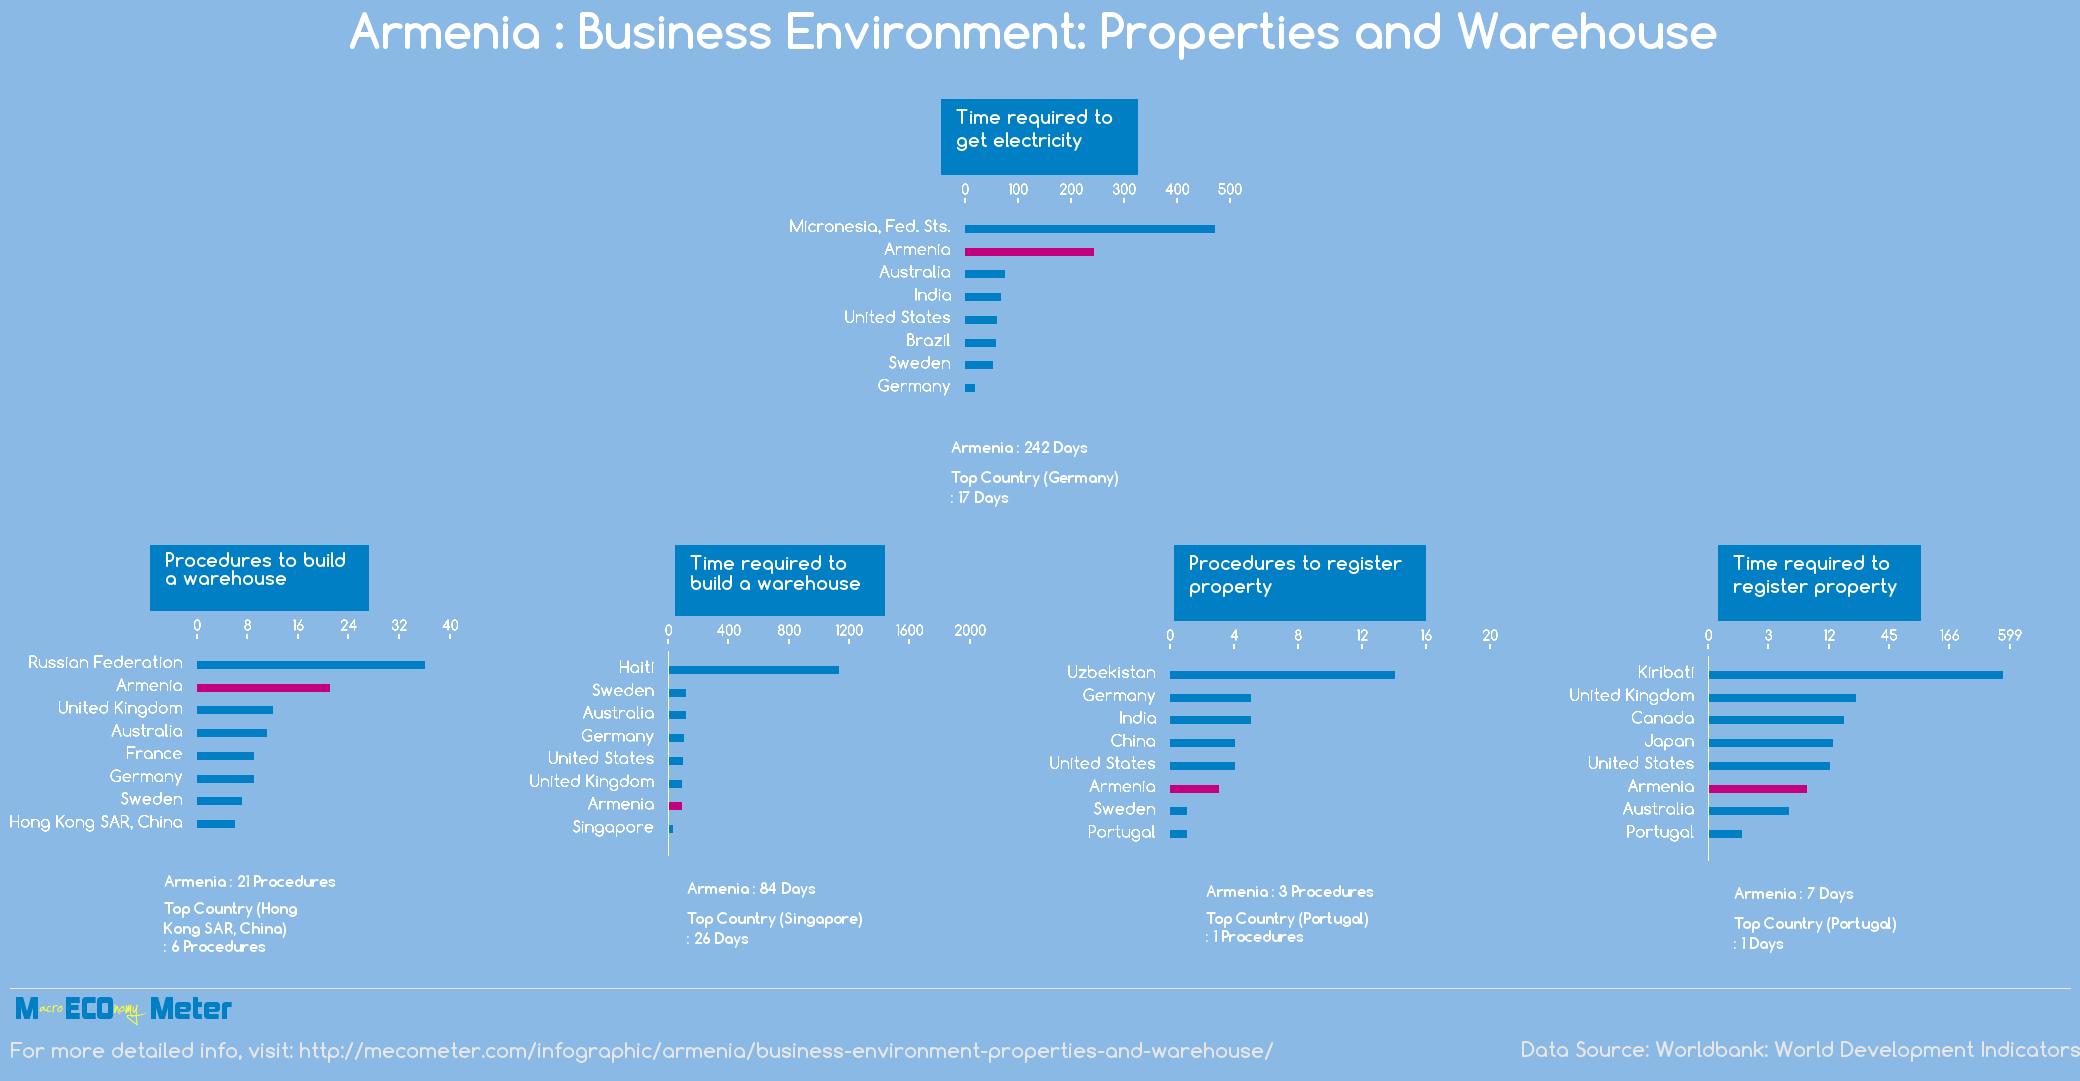 Armenia : Business Environment: Properties and Warehouse